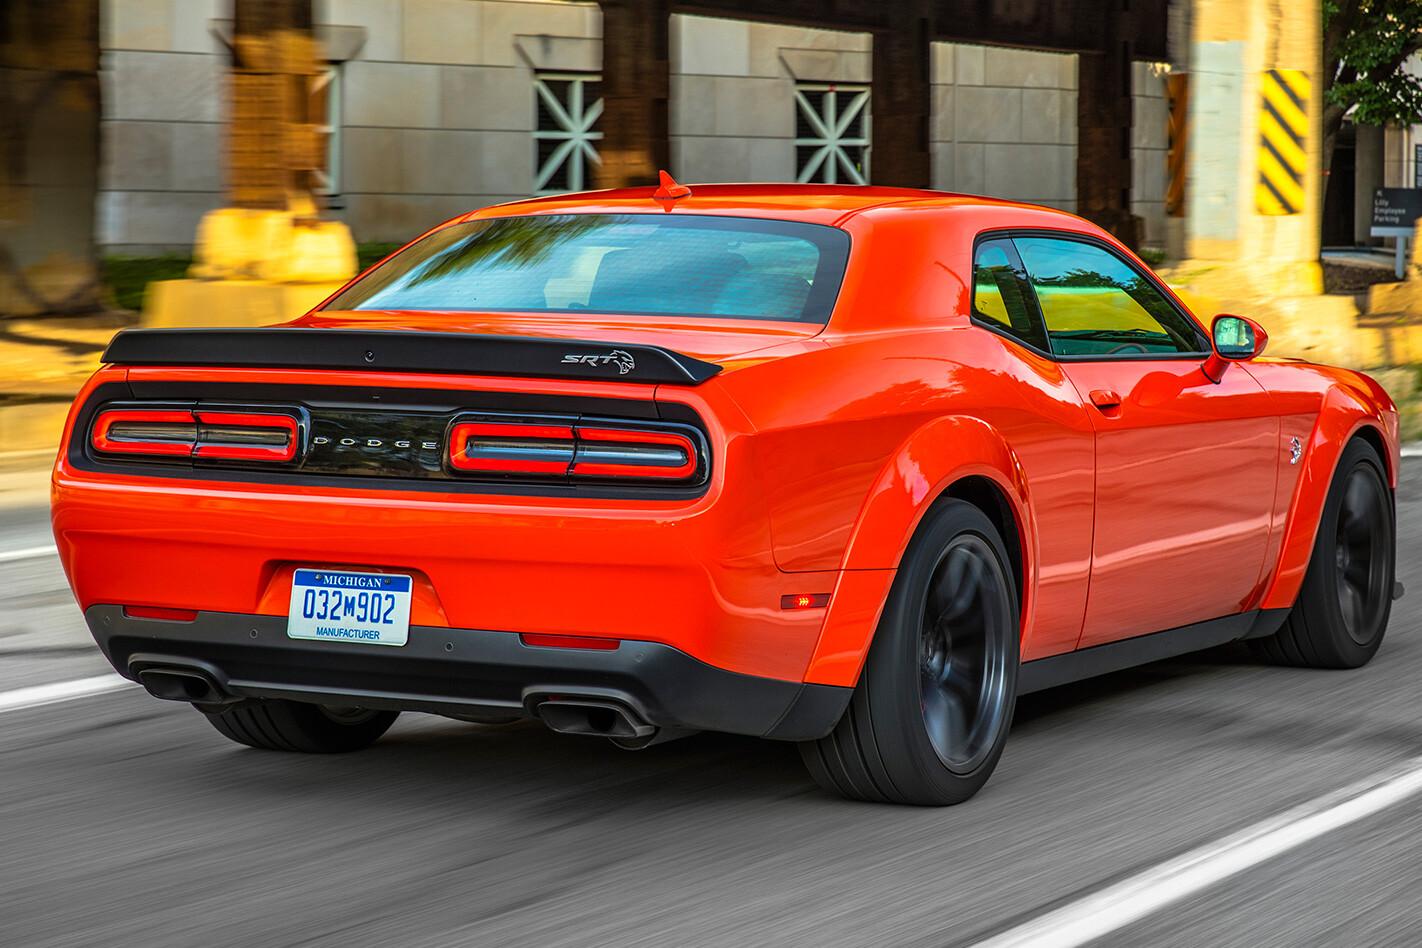 2018 Dodge Challenger SRT Demon rear